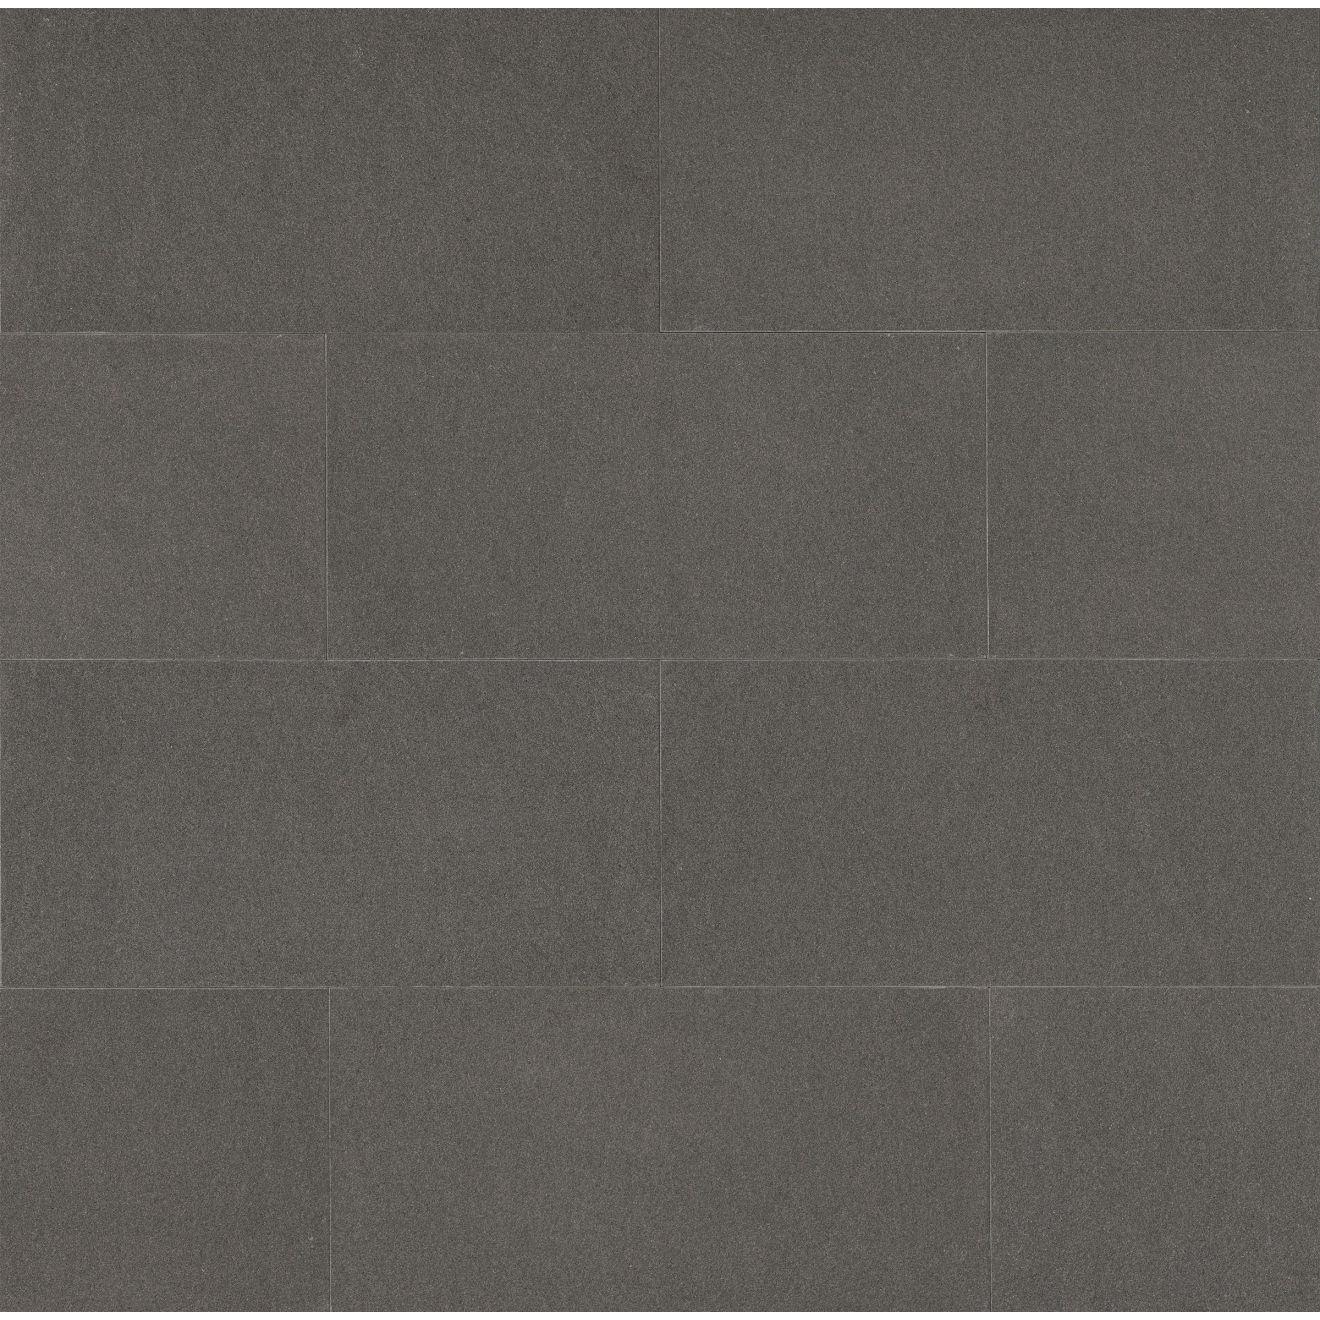 "Absolute Black 12"" x 24"" Floor & Wall Tile"